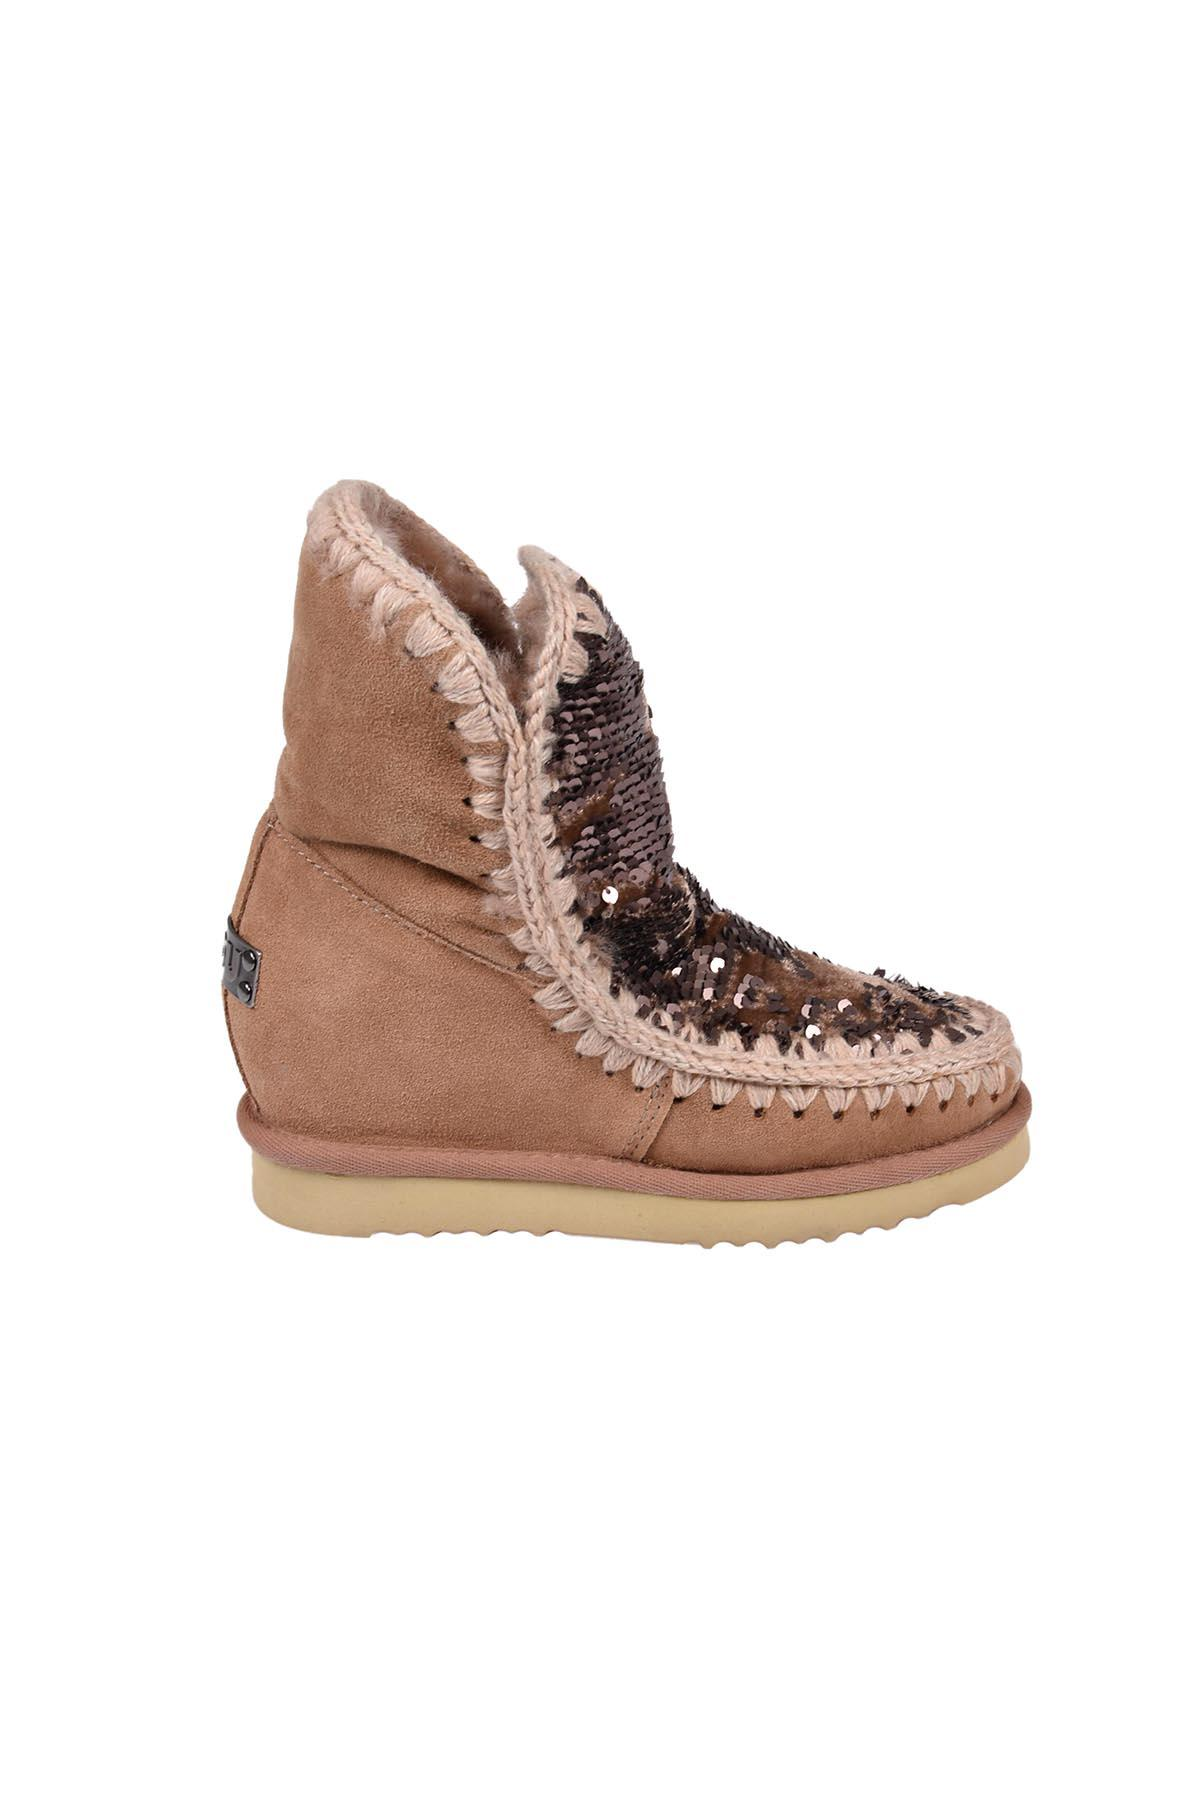 Mou Eskimo Sneaker W-strass In Seqcam Pink Paillettes